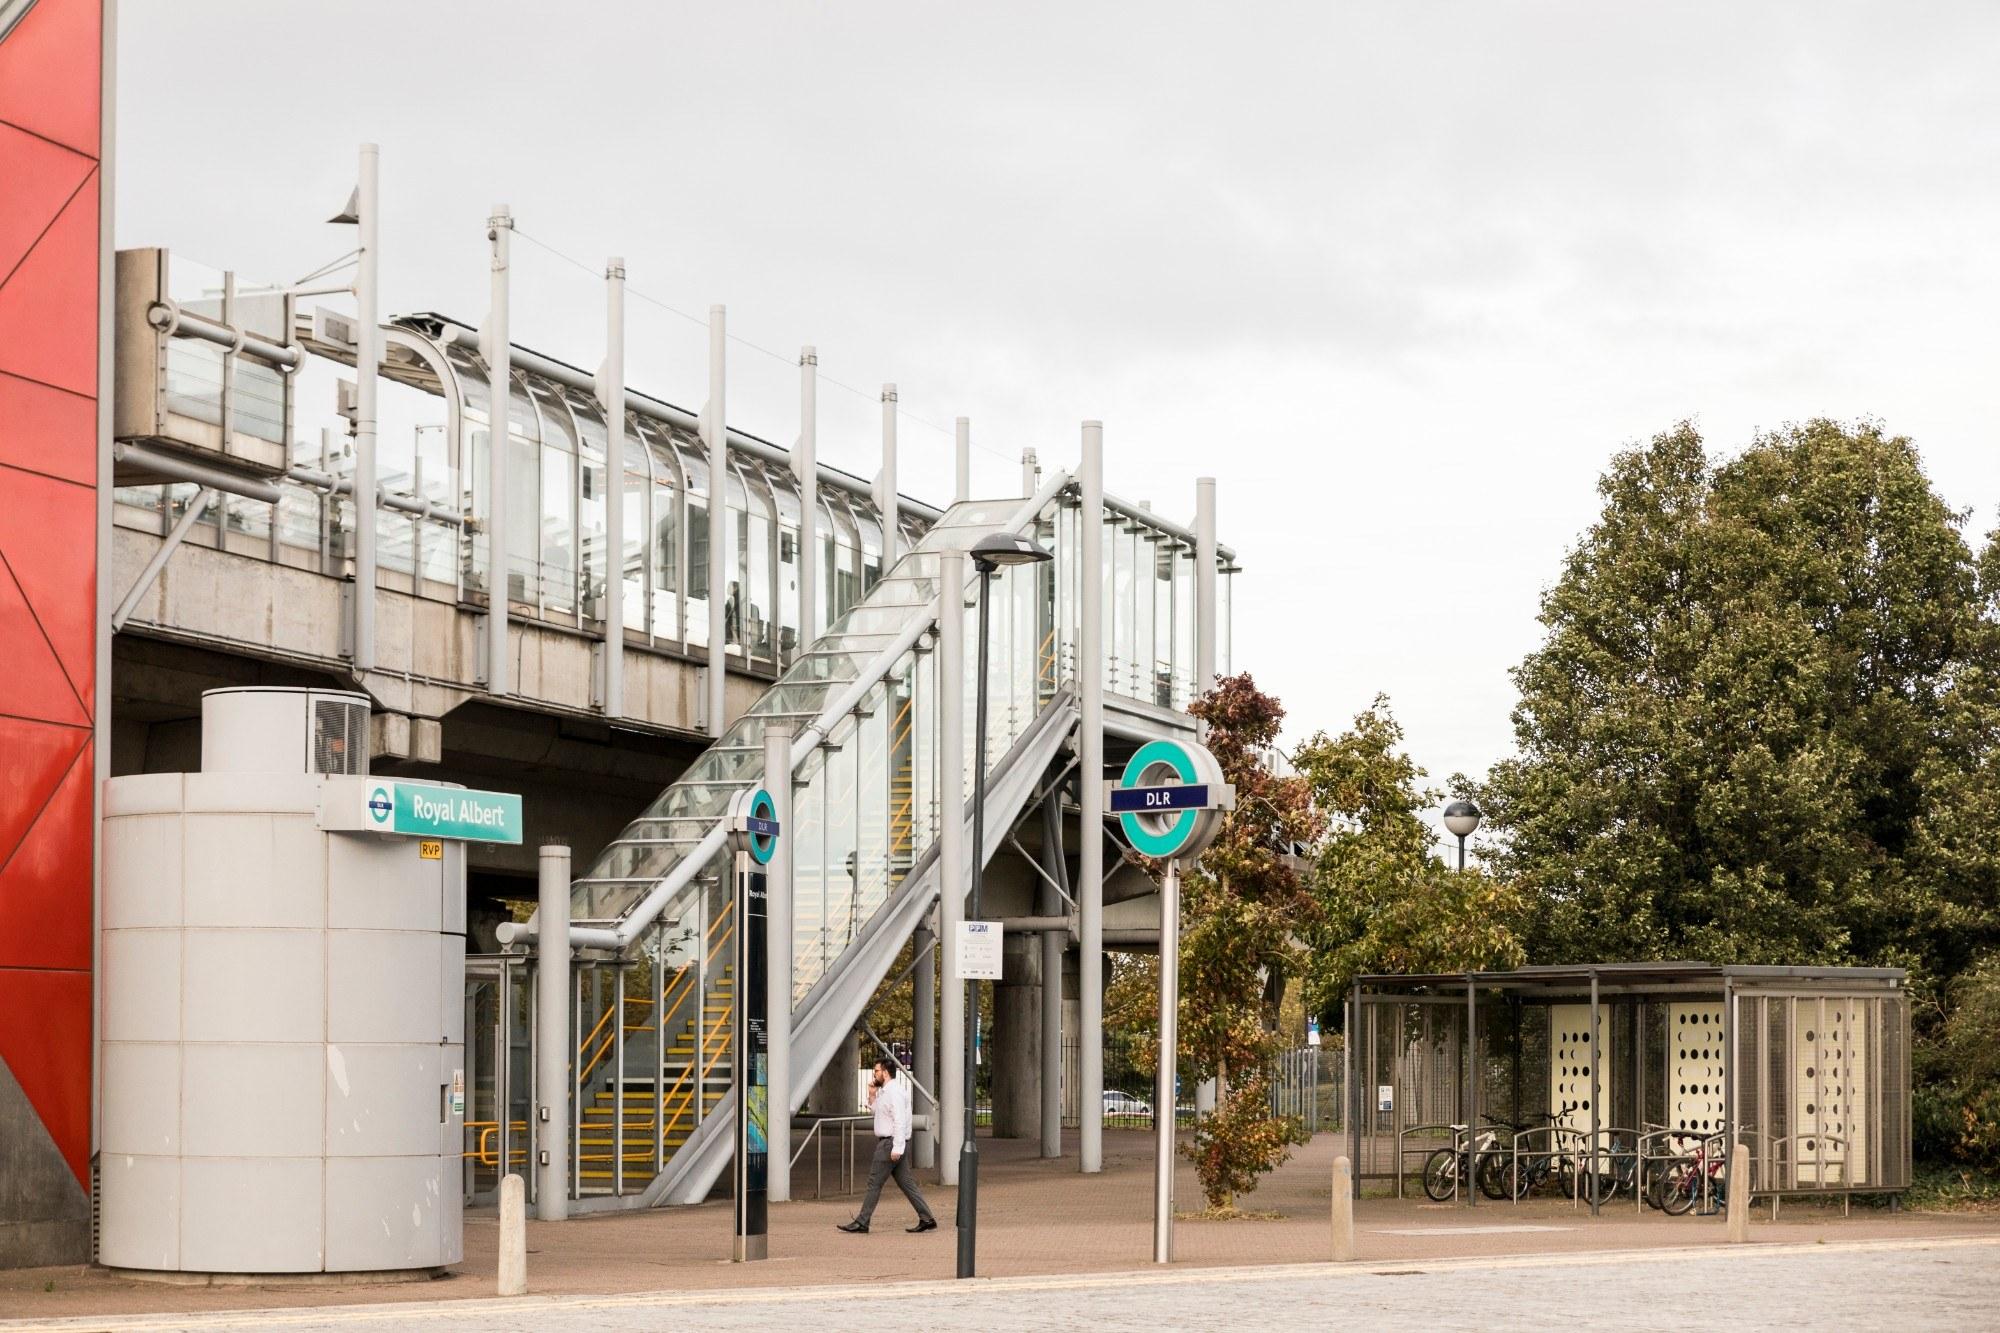 Royal Albert DLR stop in the Royal Docks